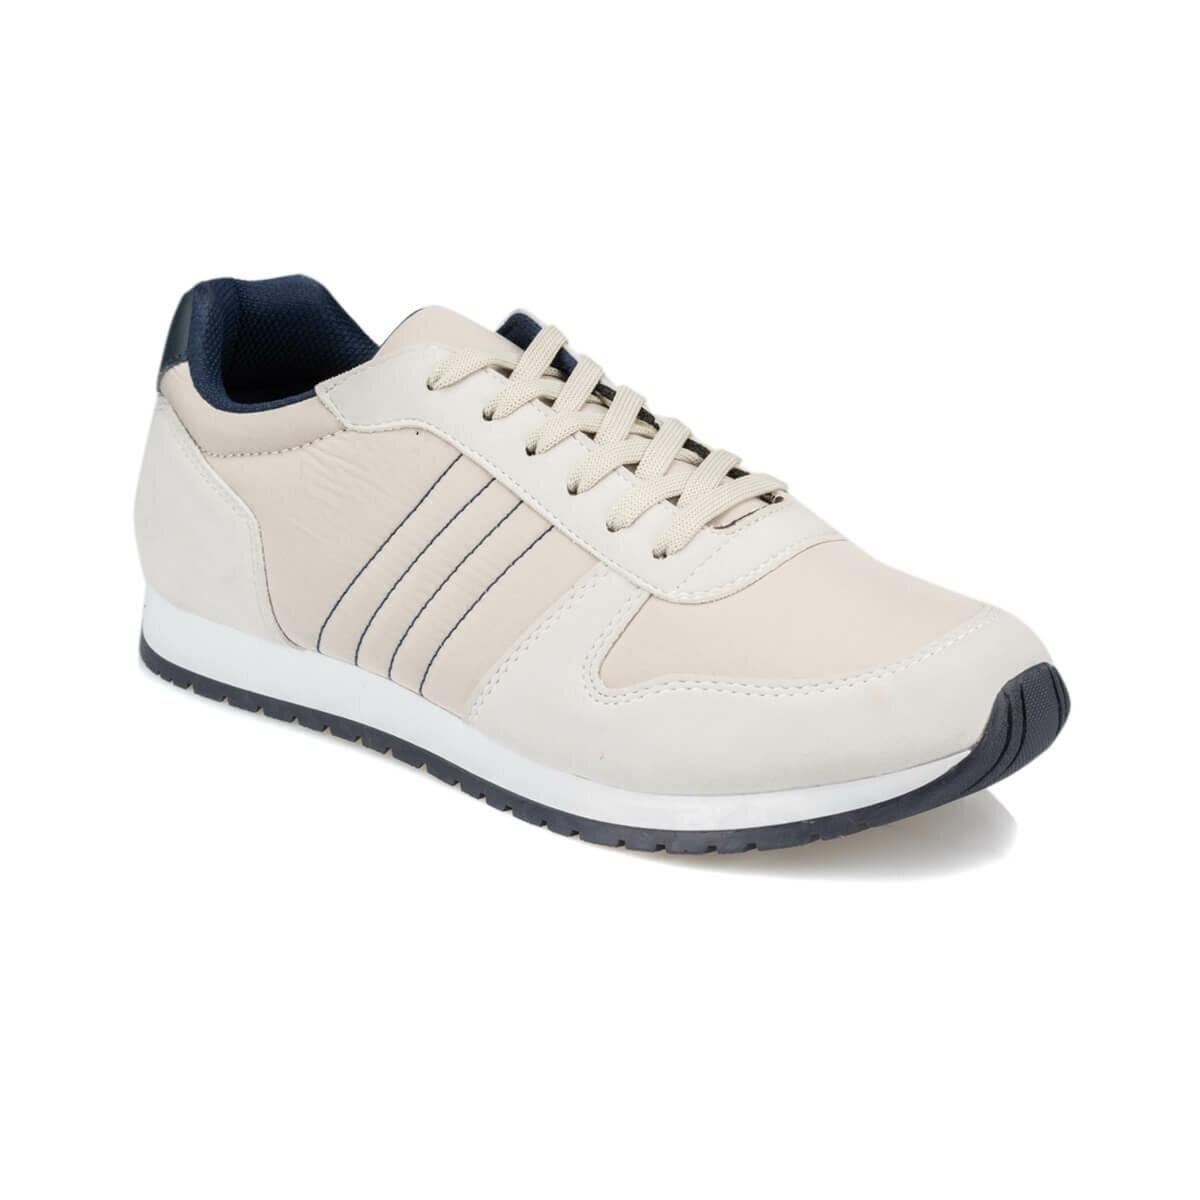 FLO 91. 356030.M Mink Male Sneaker Shoes Polaris